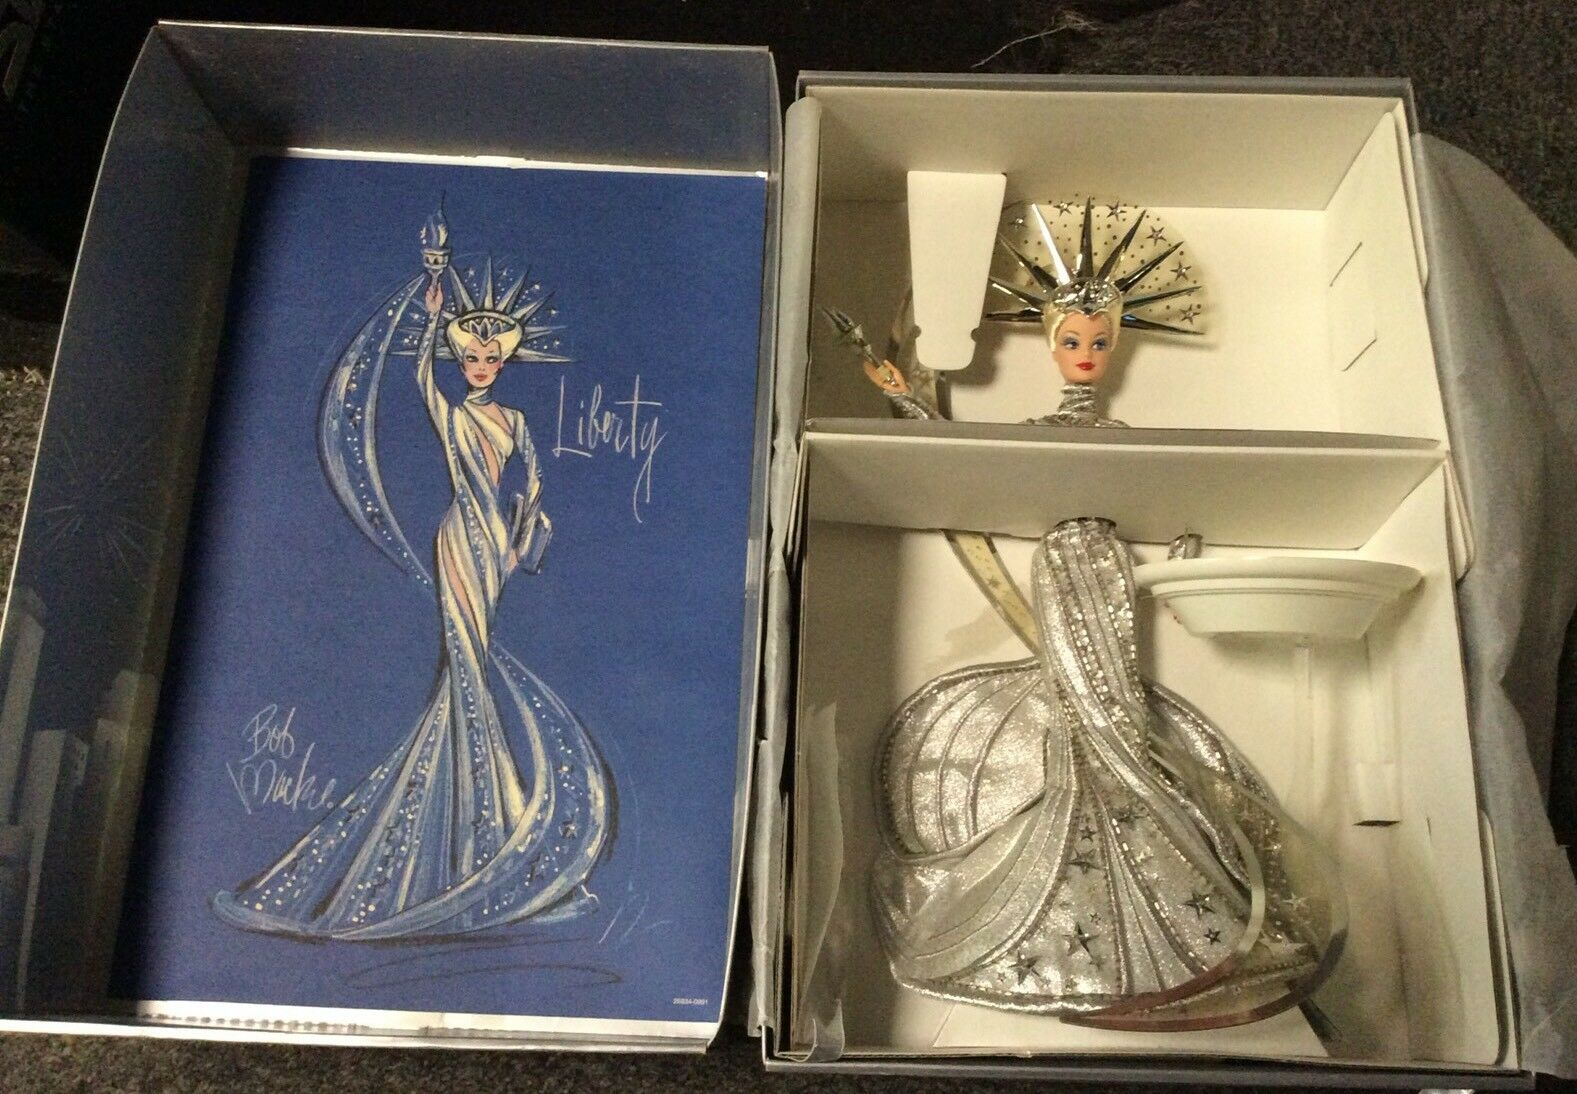 Muñeca Barbie LADY LIBERTY edición limitada de Bob Mackie para FAO negro MIB